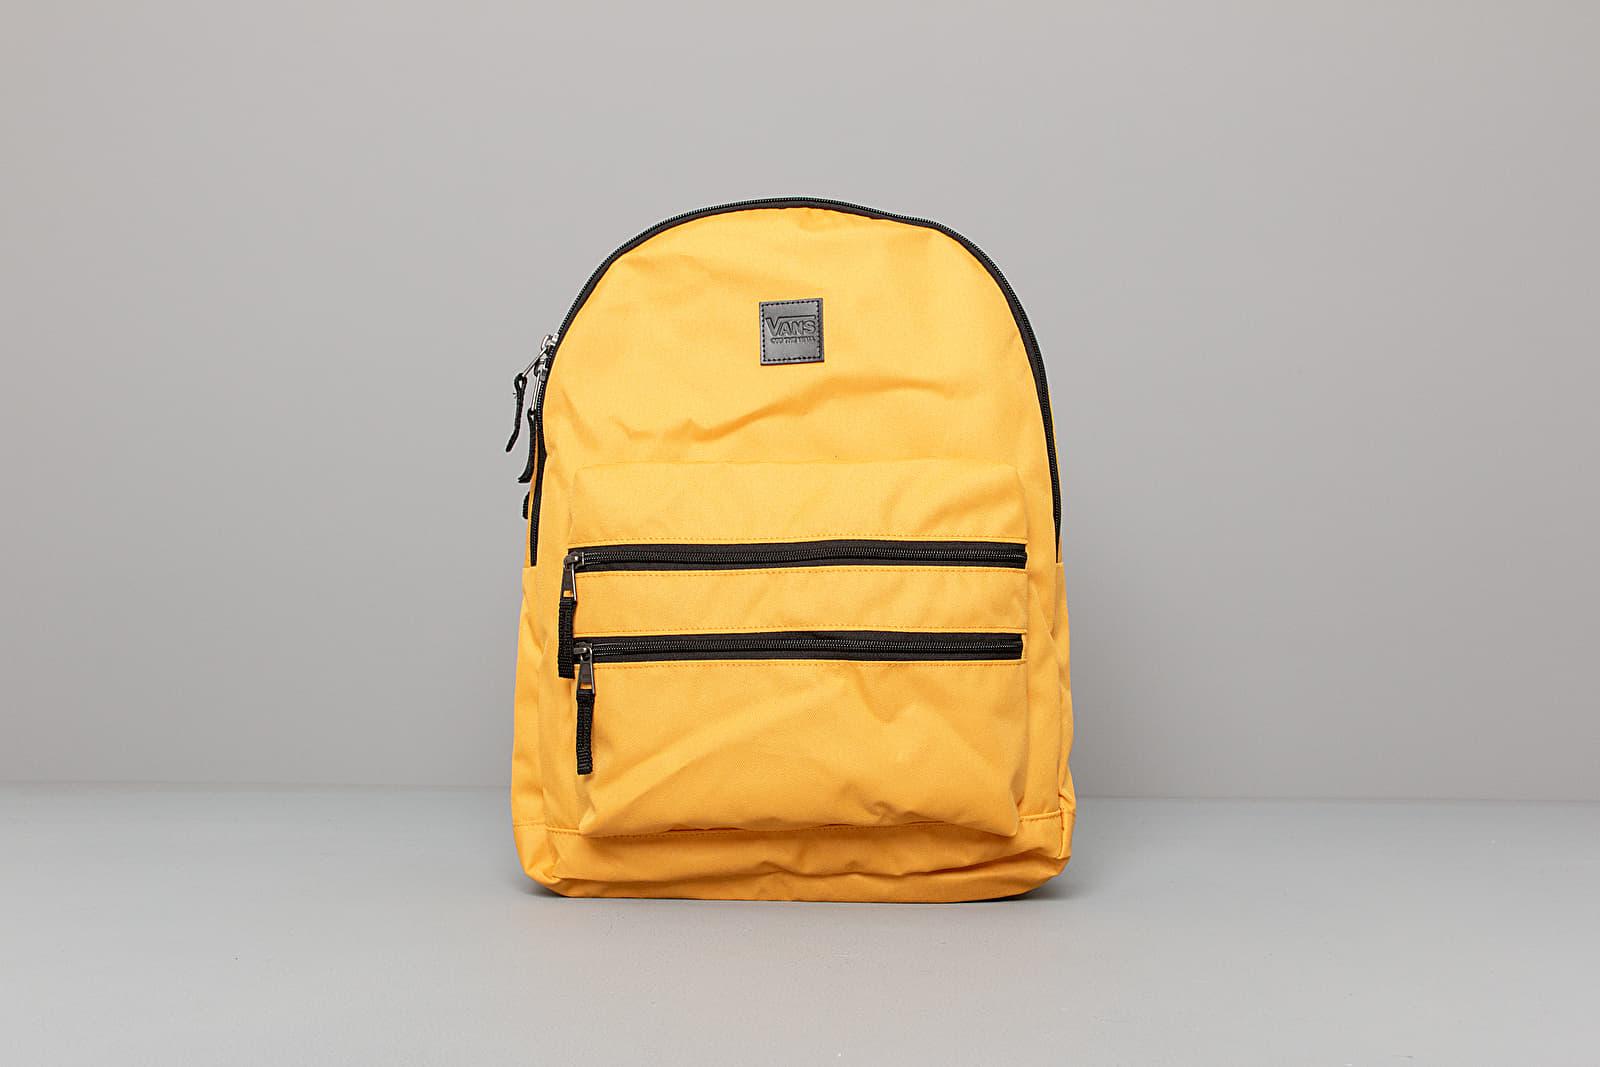 Batohy Vans Schoolin It Backpack Mango Mojito